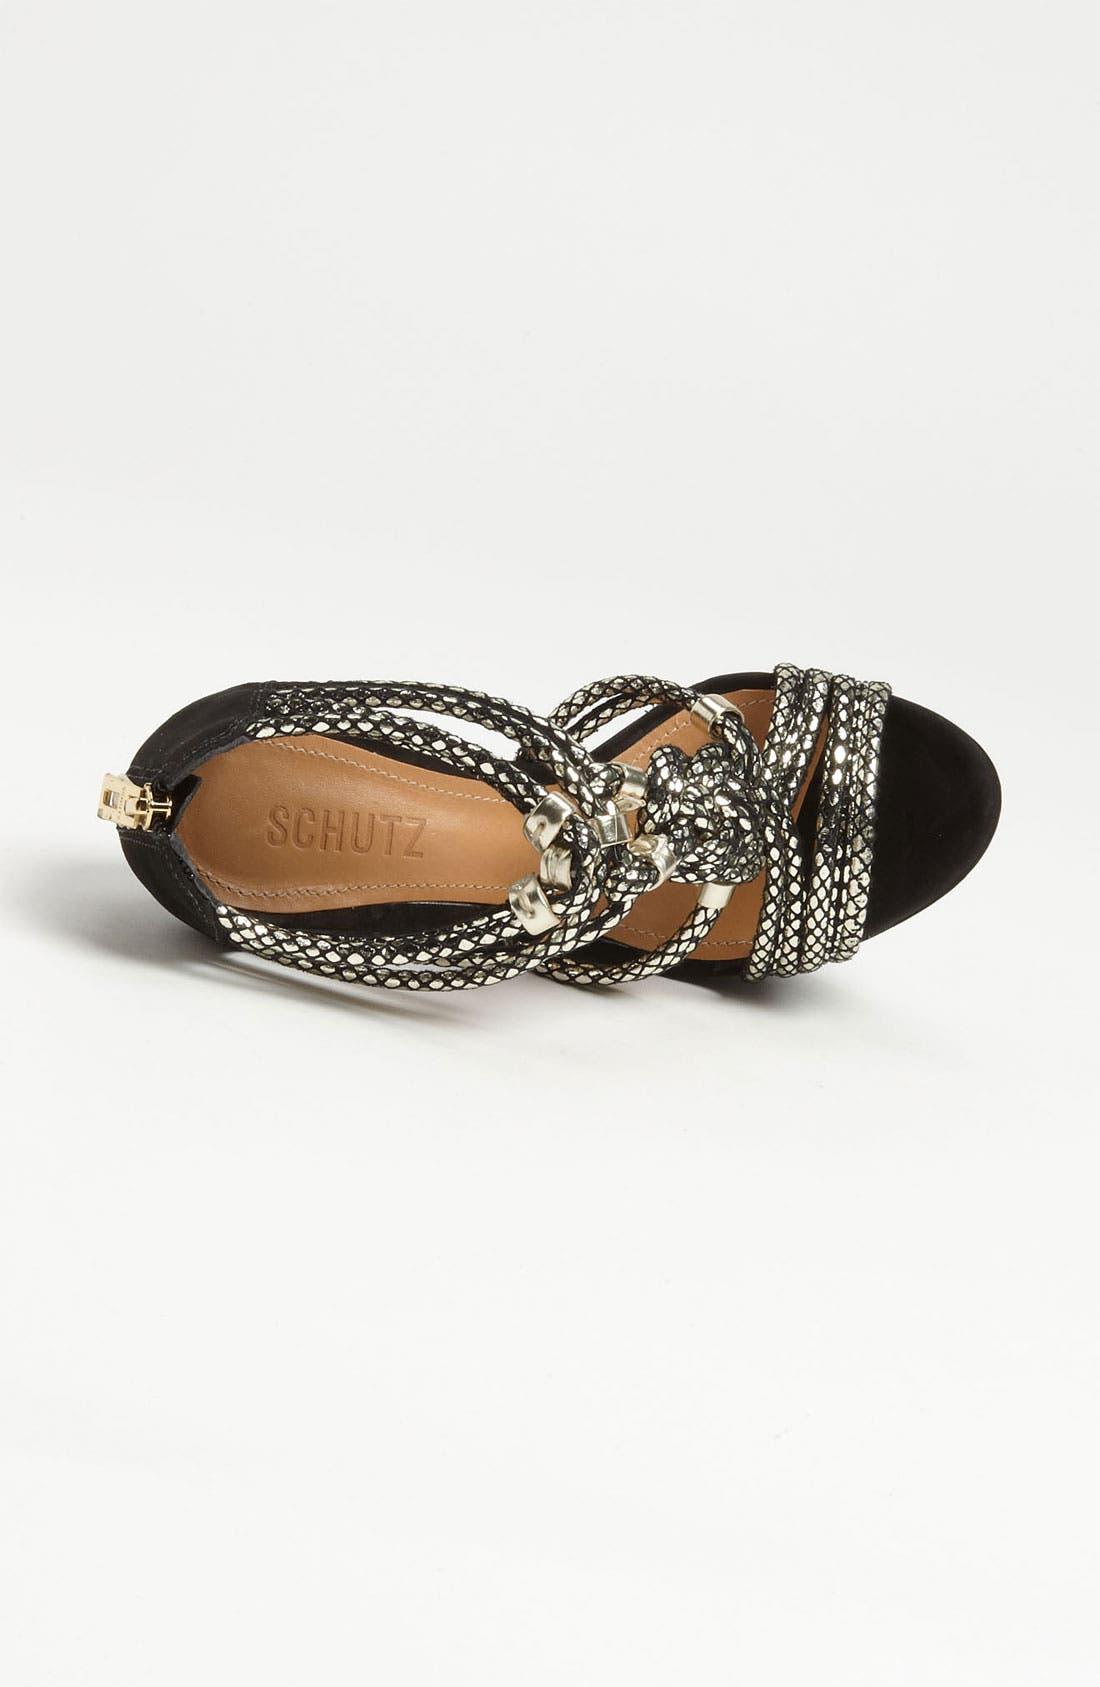 Alternate Image 3  - Schutz 'Isaura' Wedge Sandal